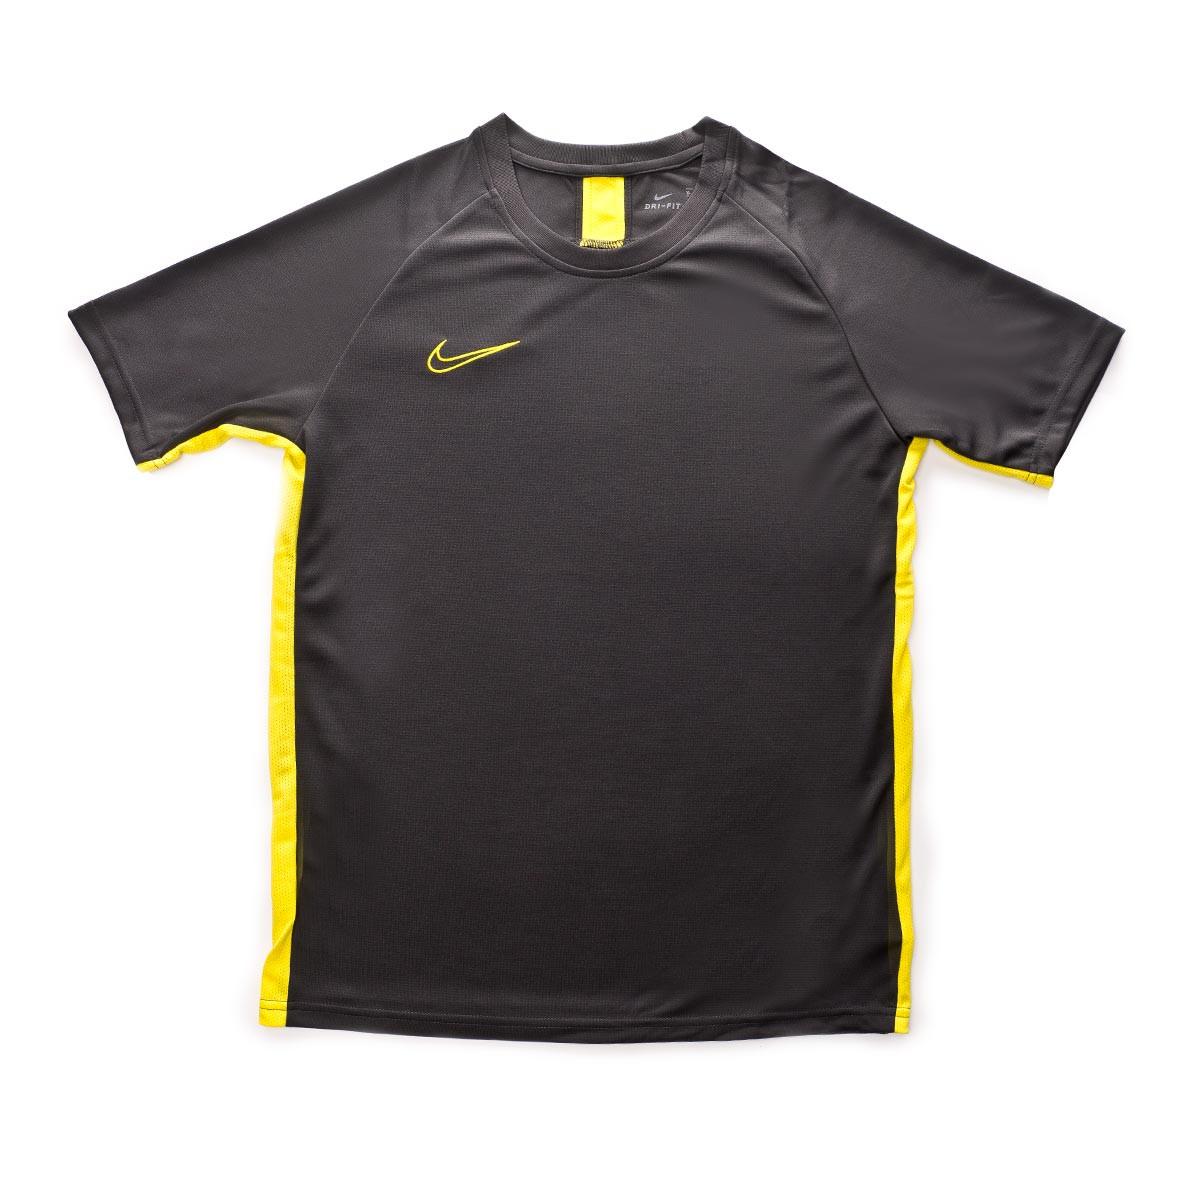 Maillot Nike Dri FIT Academy enfant